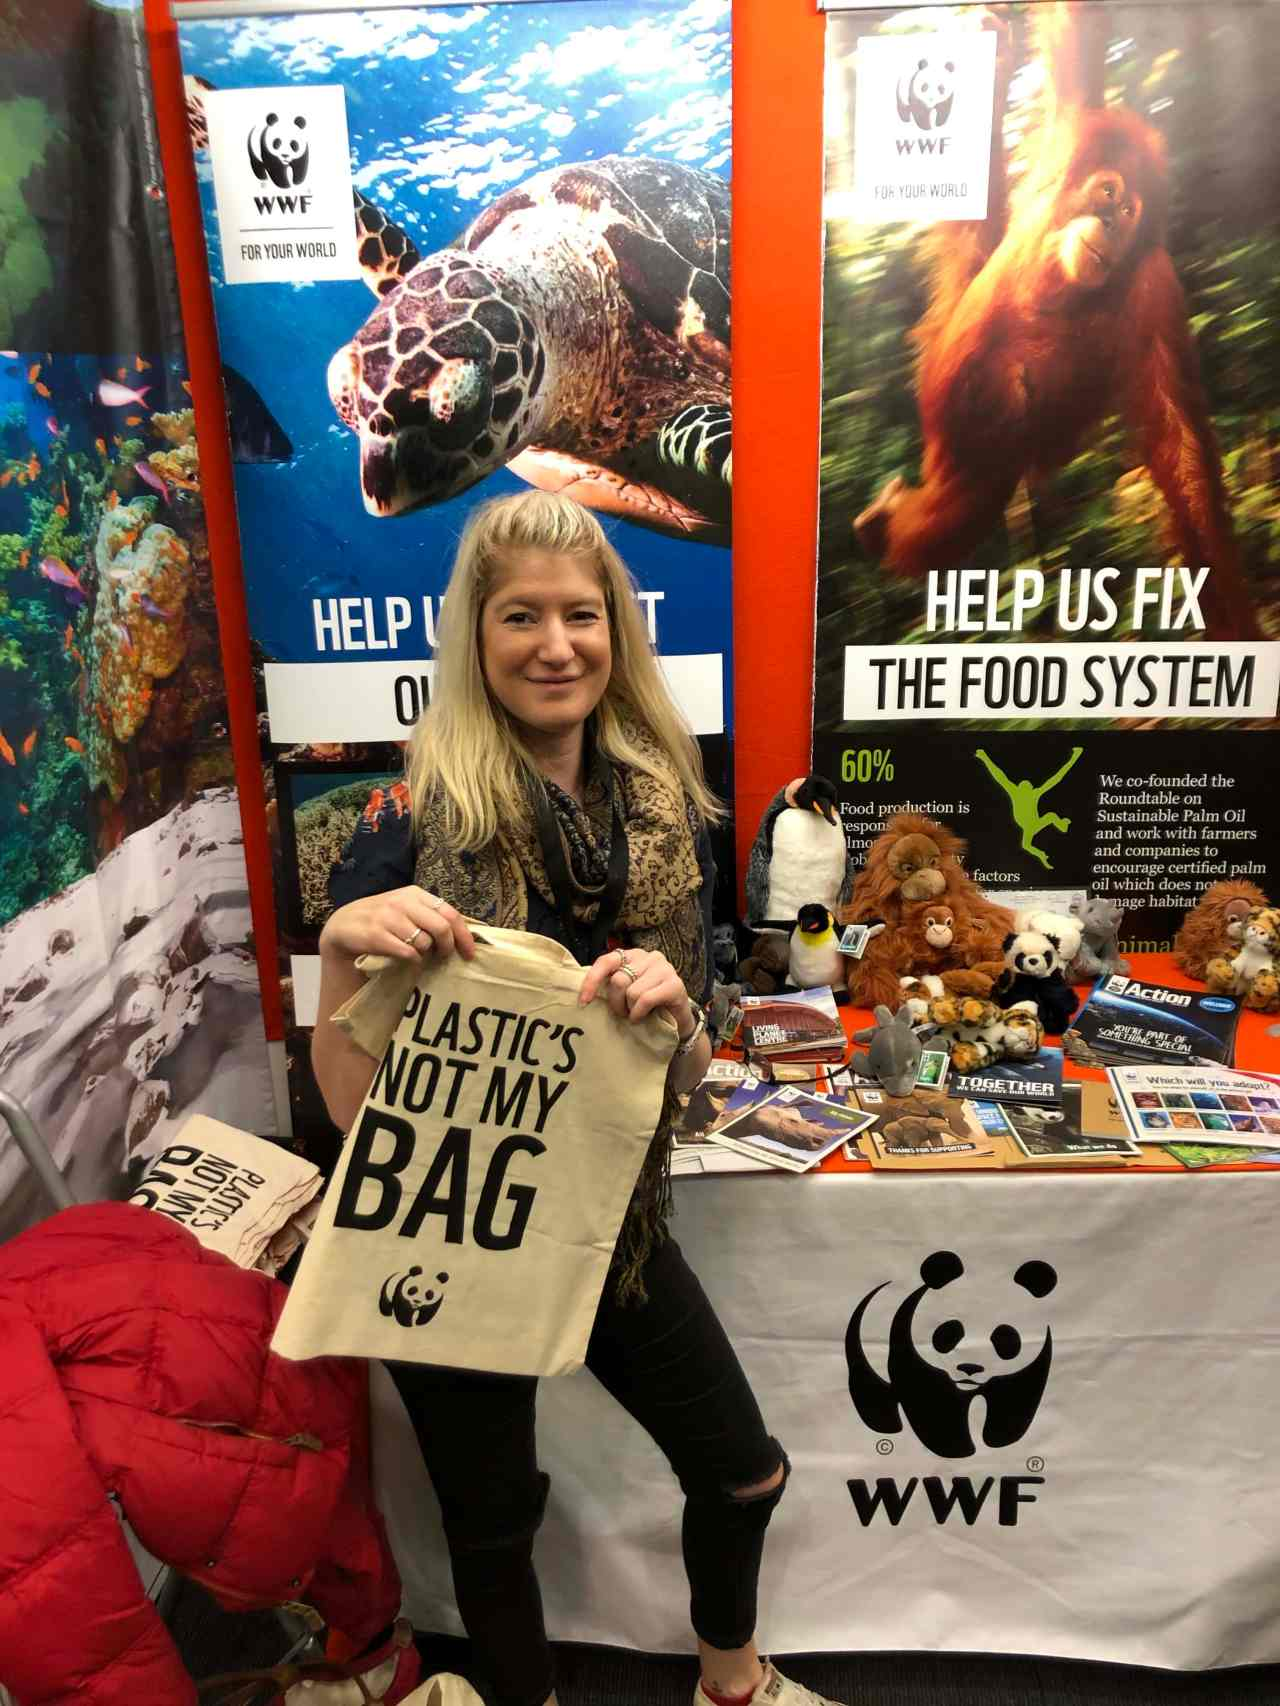 signing up for WWF membership